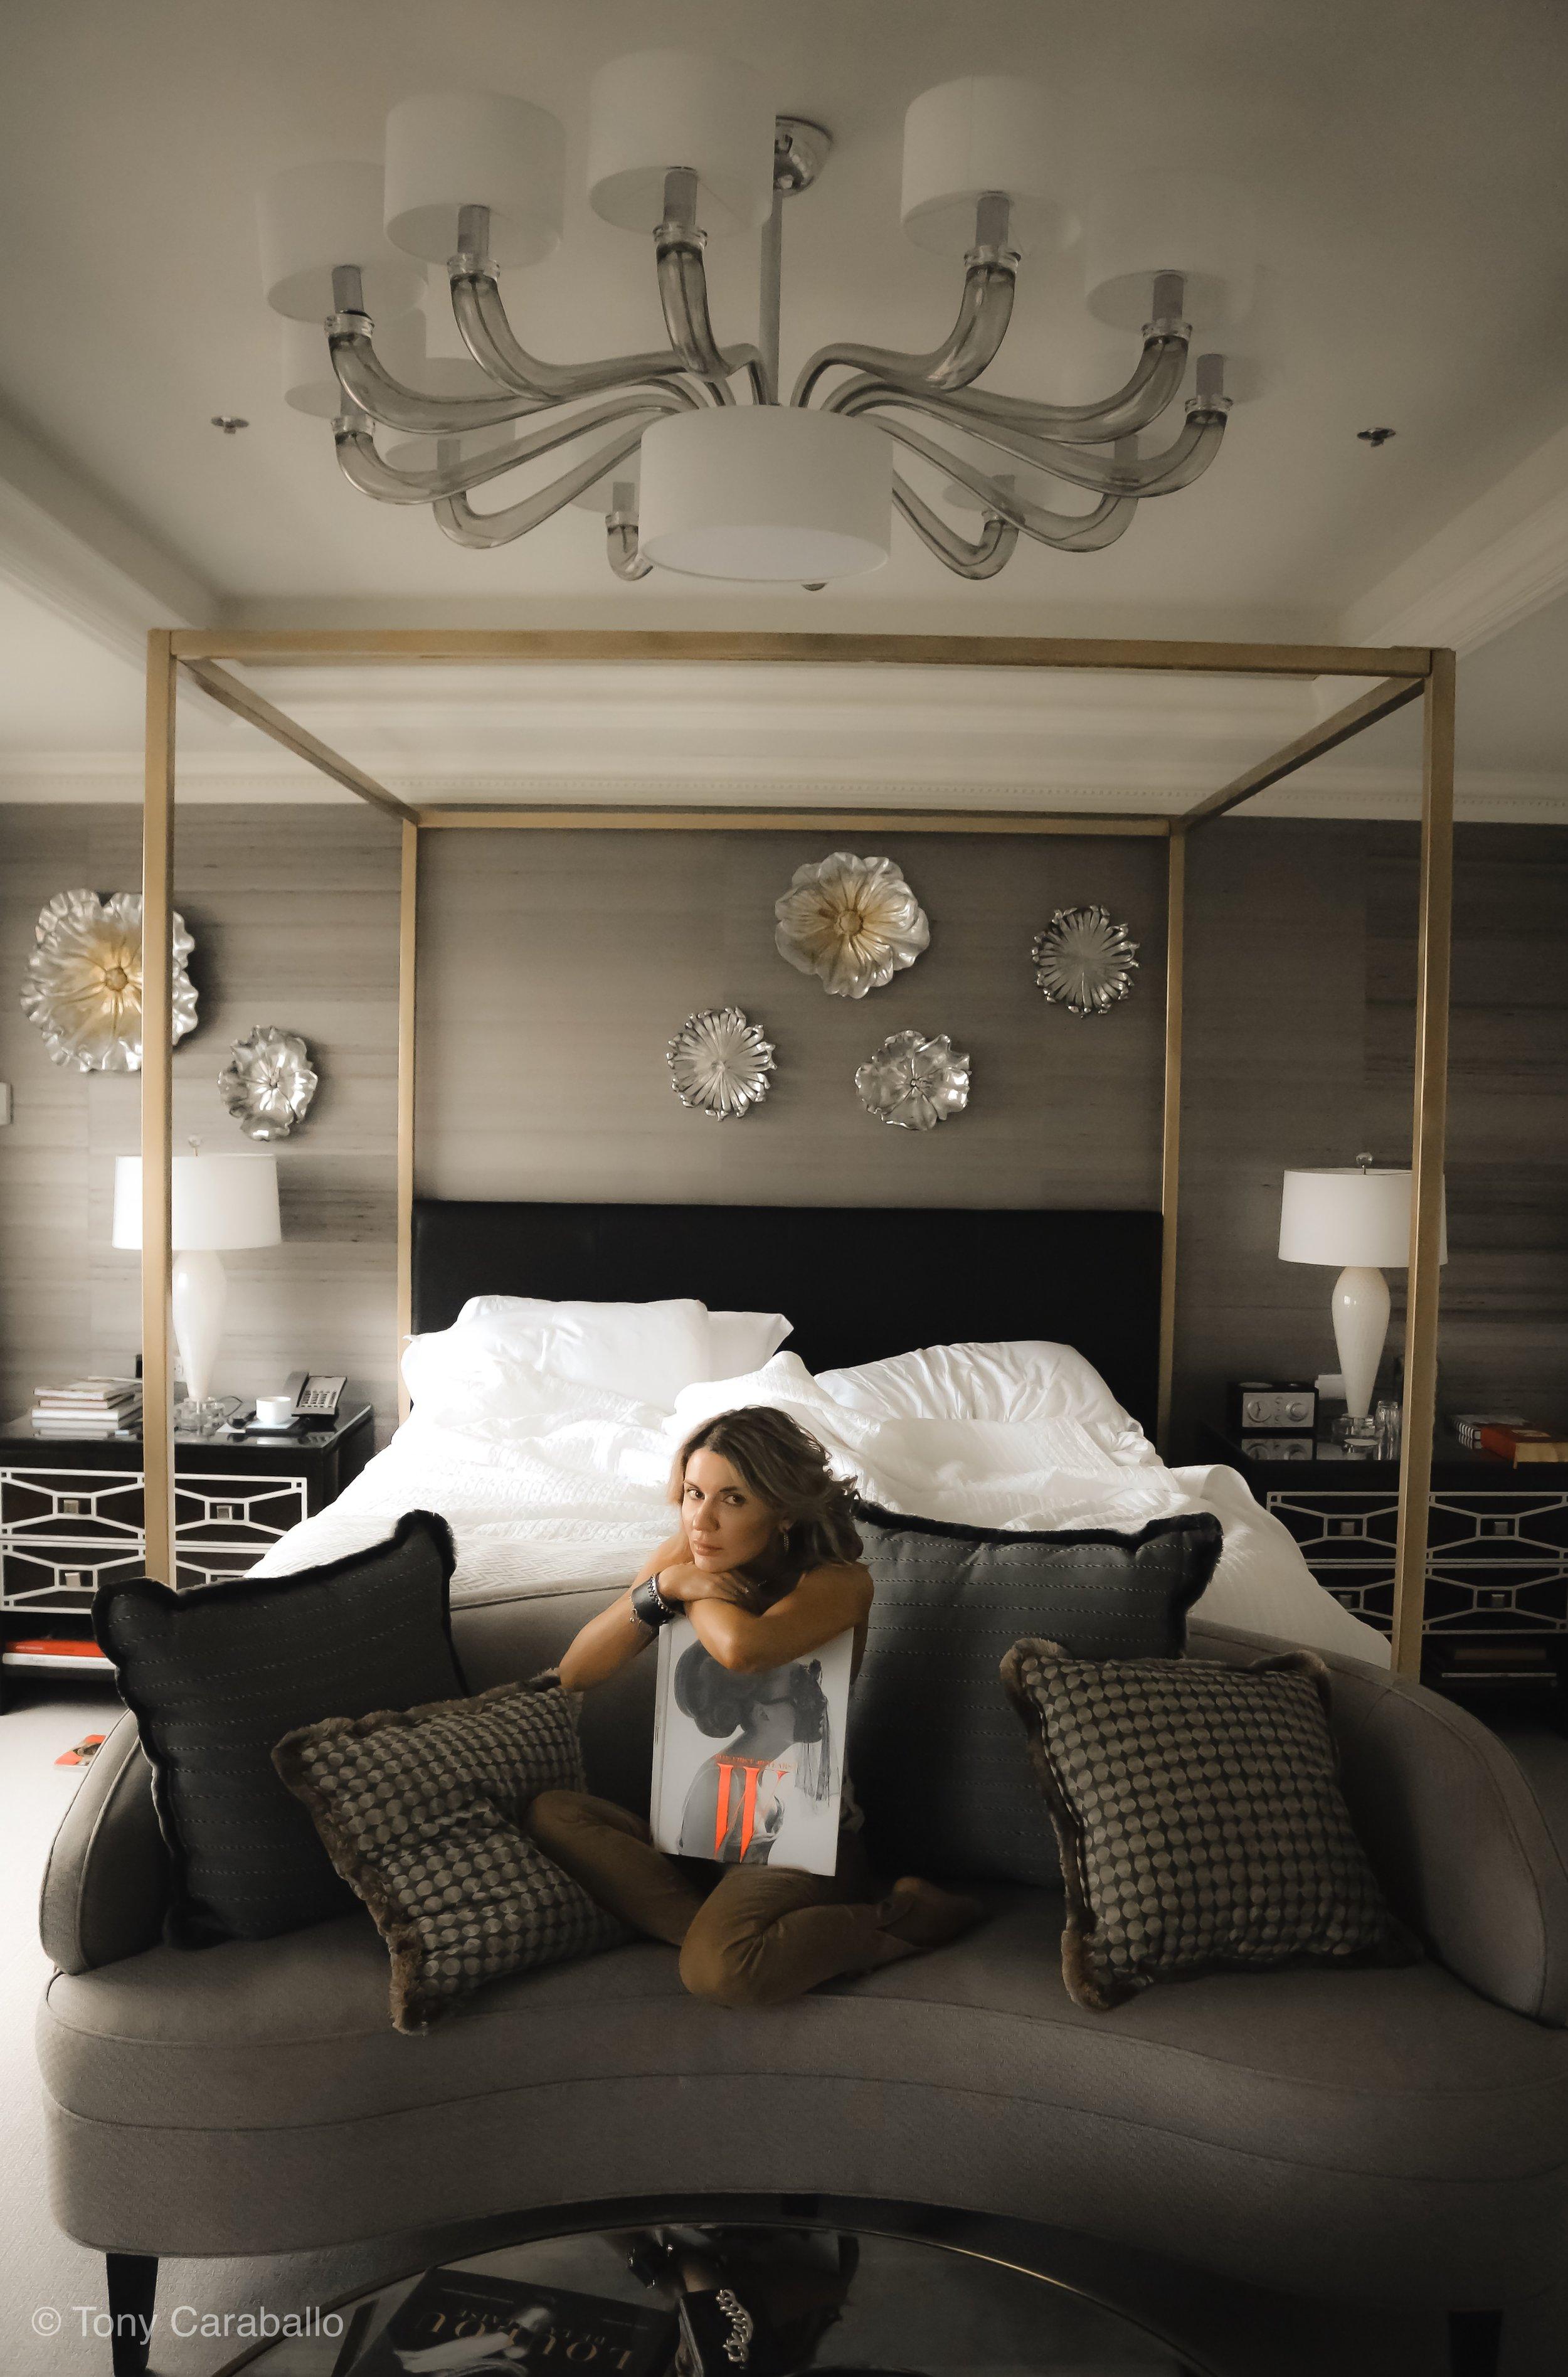 Ritz Carlton Presidential Suite Isabel Alexander sitting in the bedroom